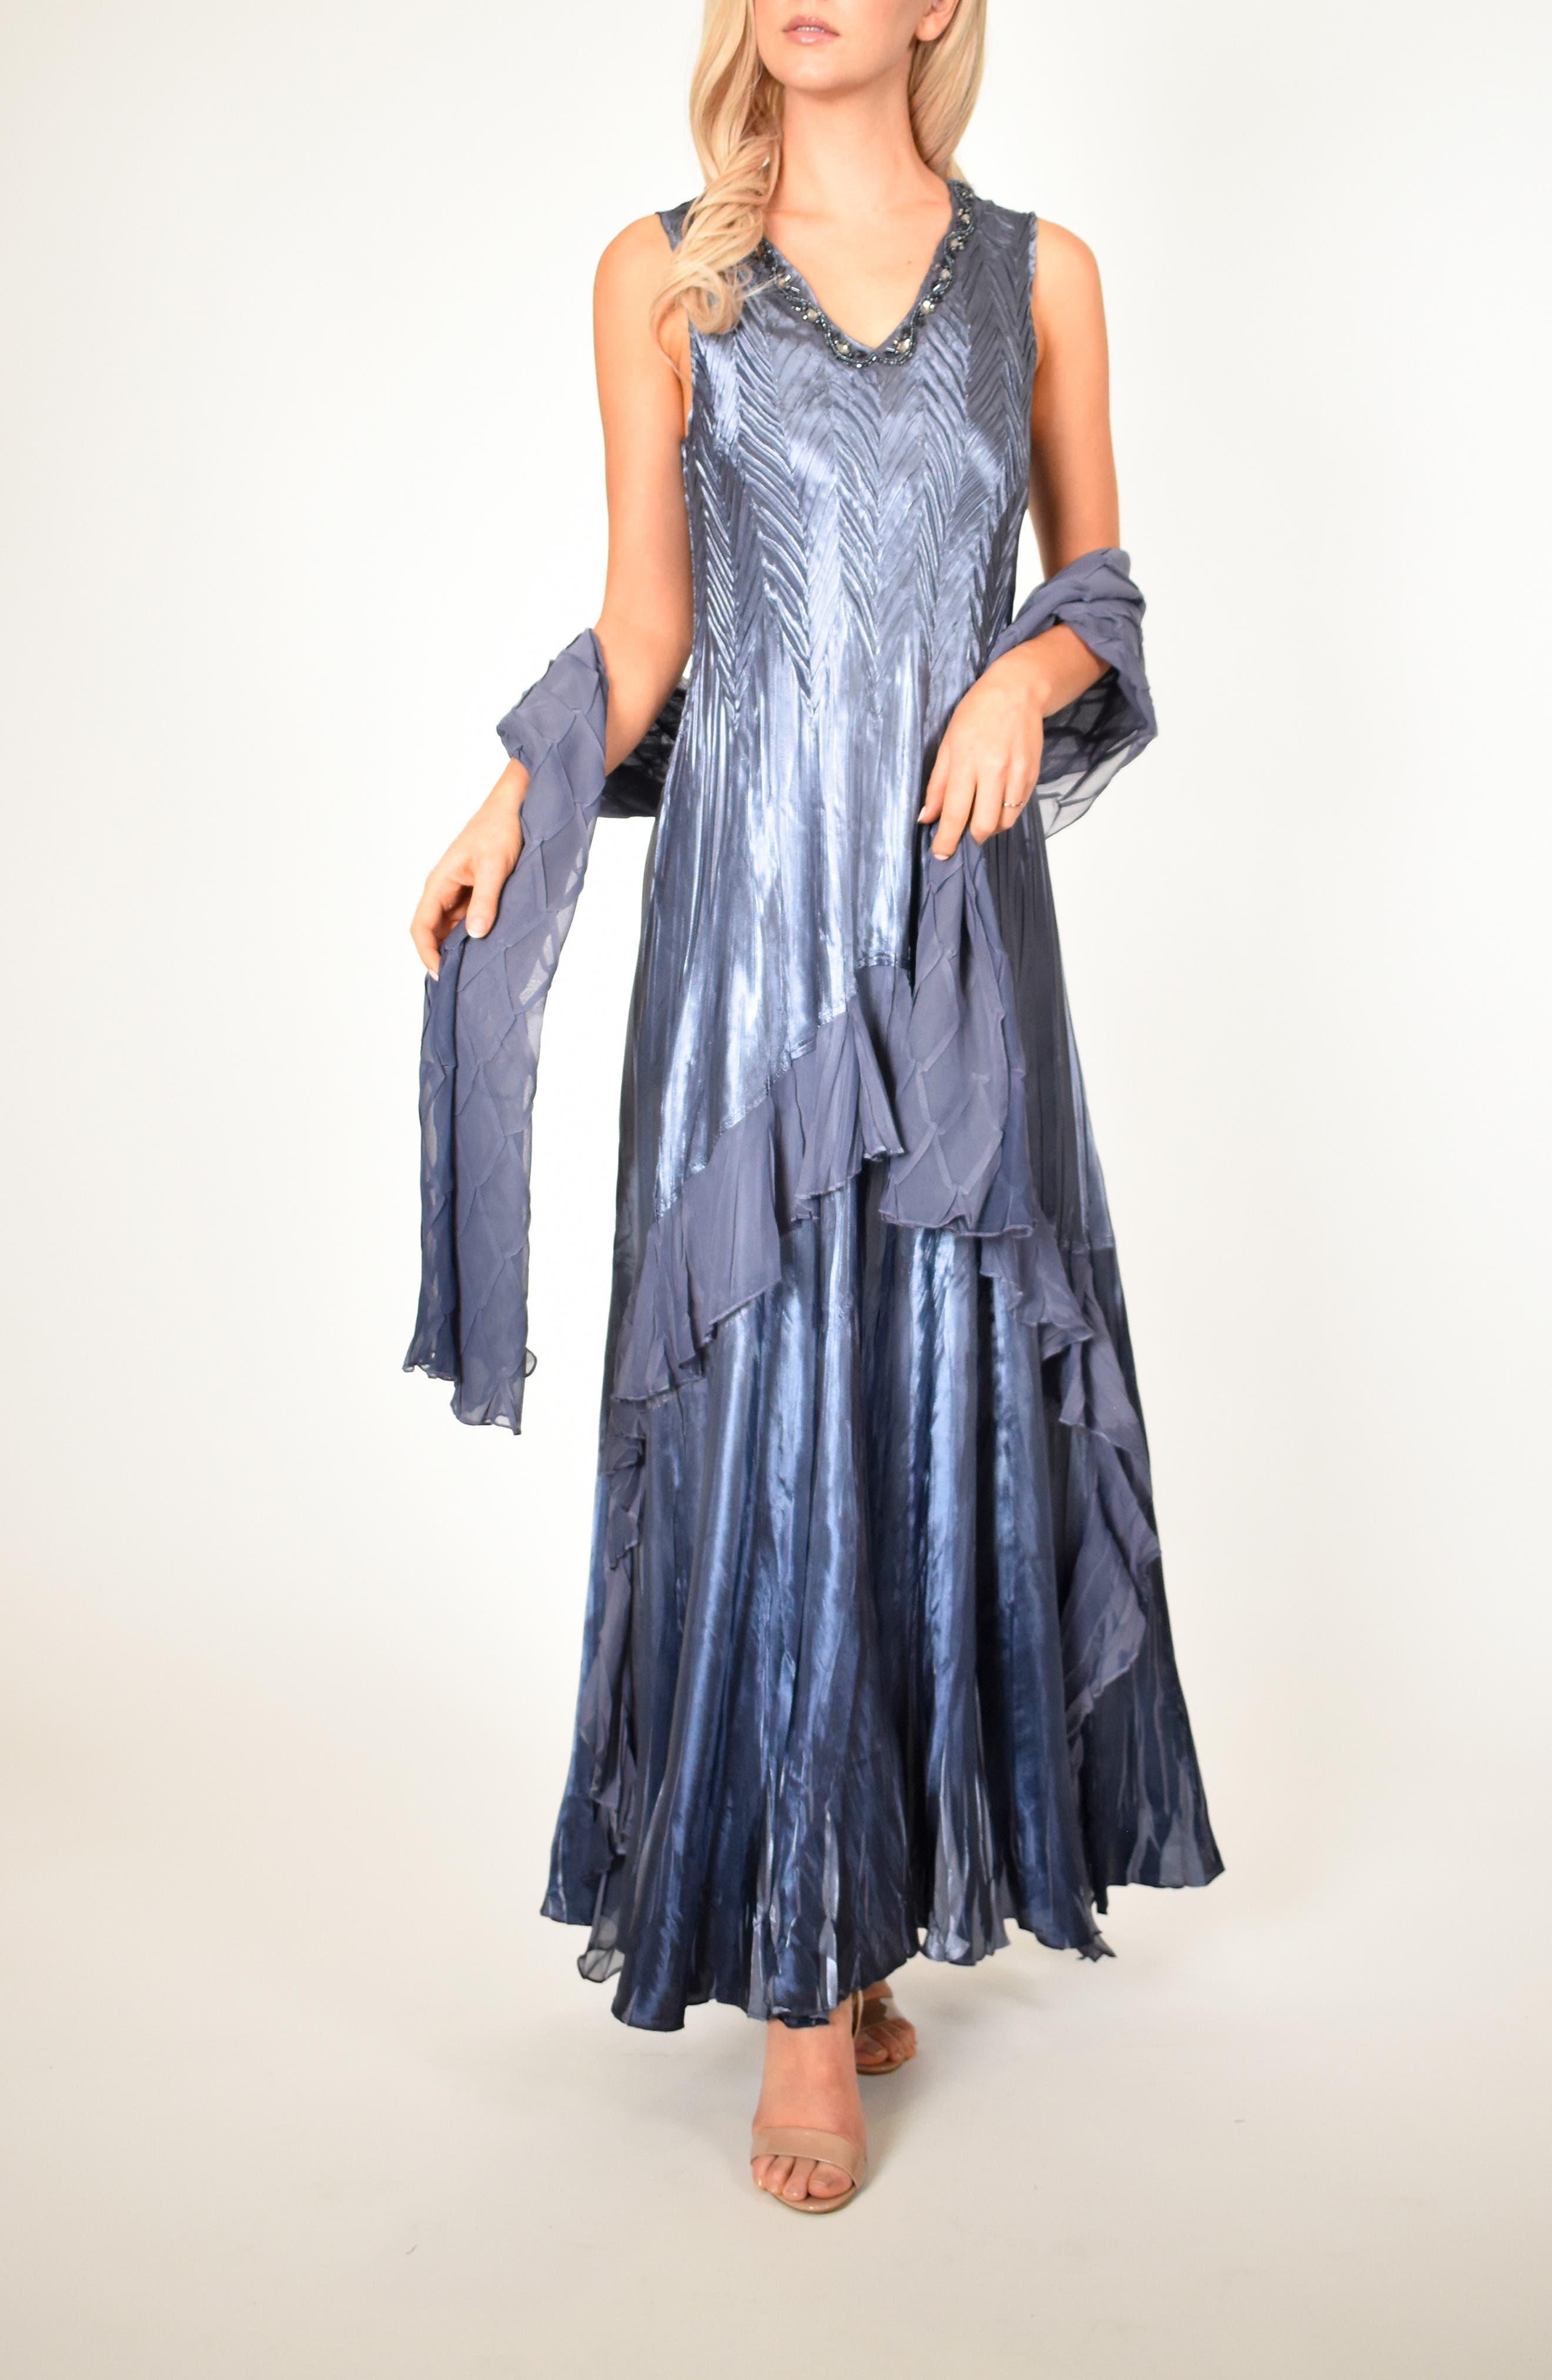 KOMAROV Beaded V-Neck Charmeuse & Chiffon Evening Dress with Wrap, Main, color, PURPLE SAGE BLUE OMBRE